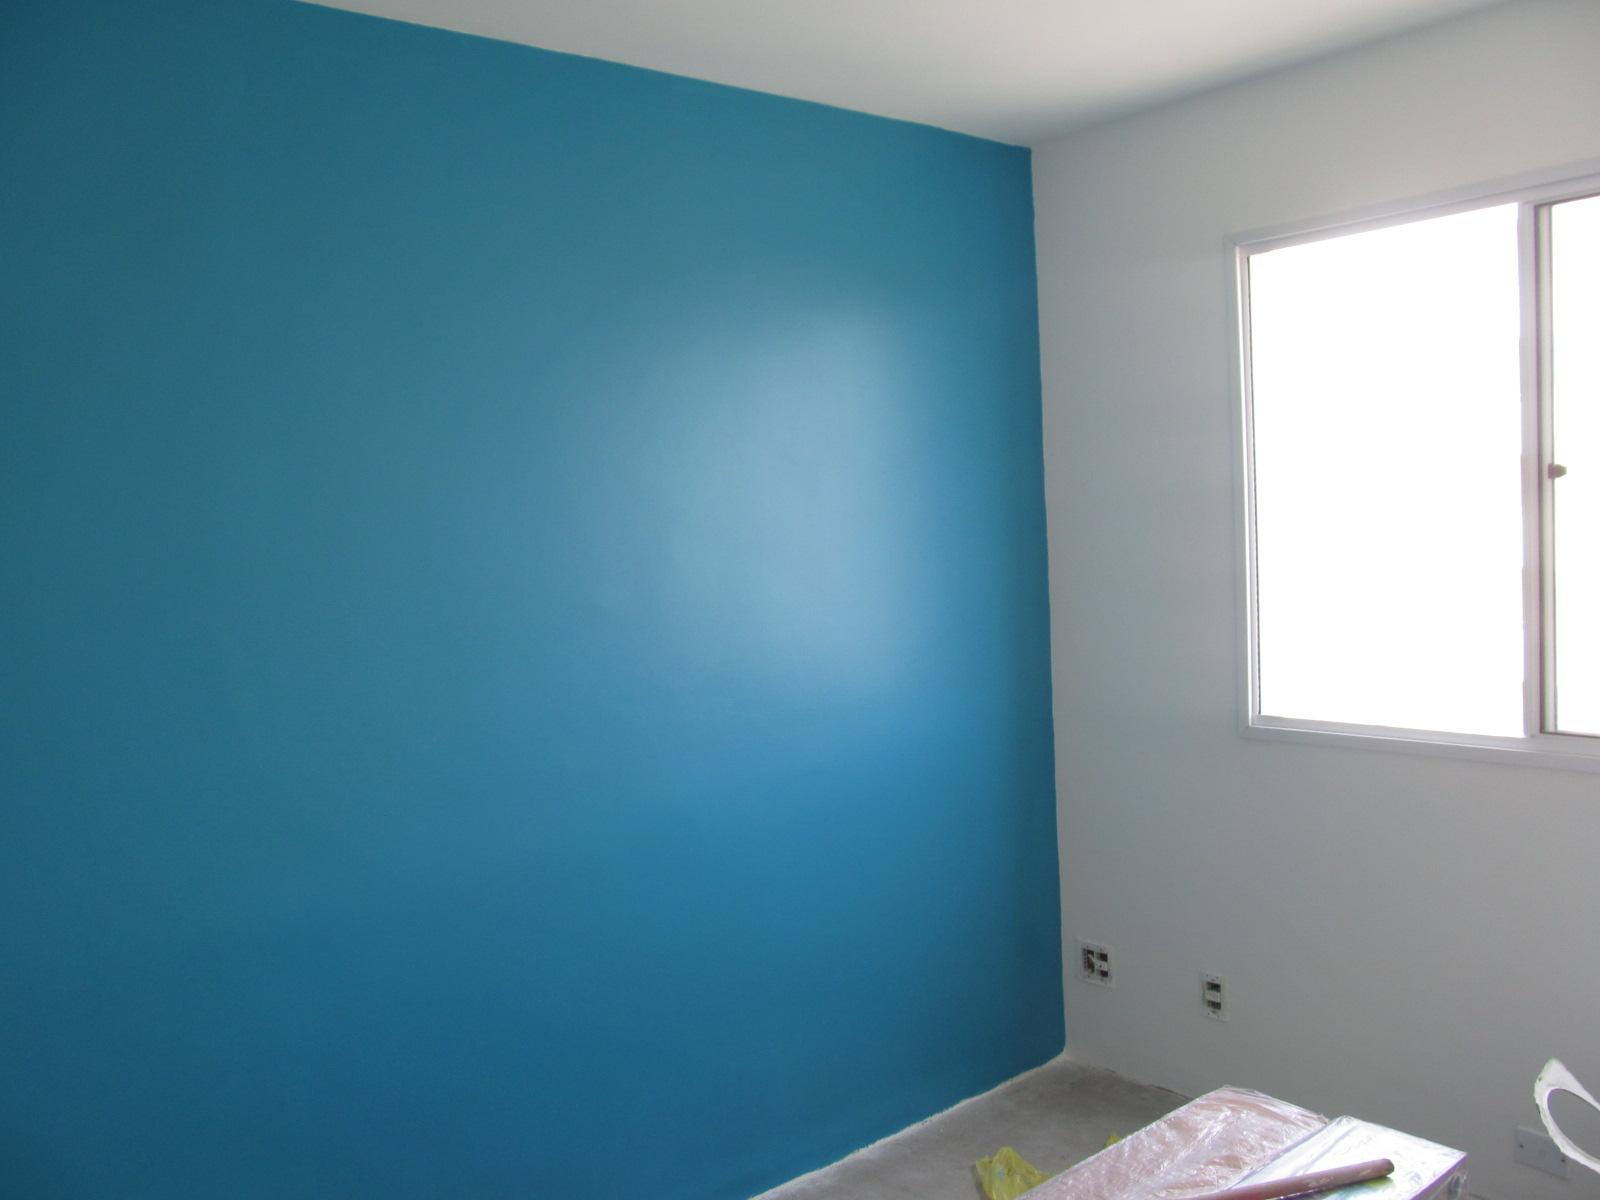 301 Moved Permanently ~ Tinta Para Quarto Azul Turquesa